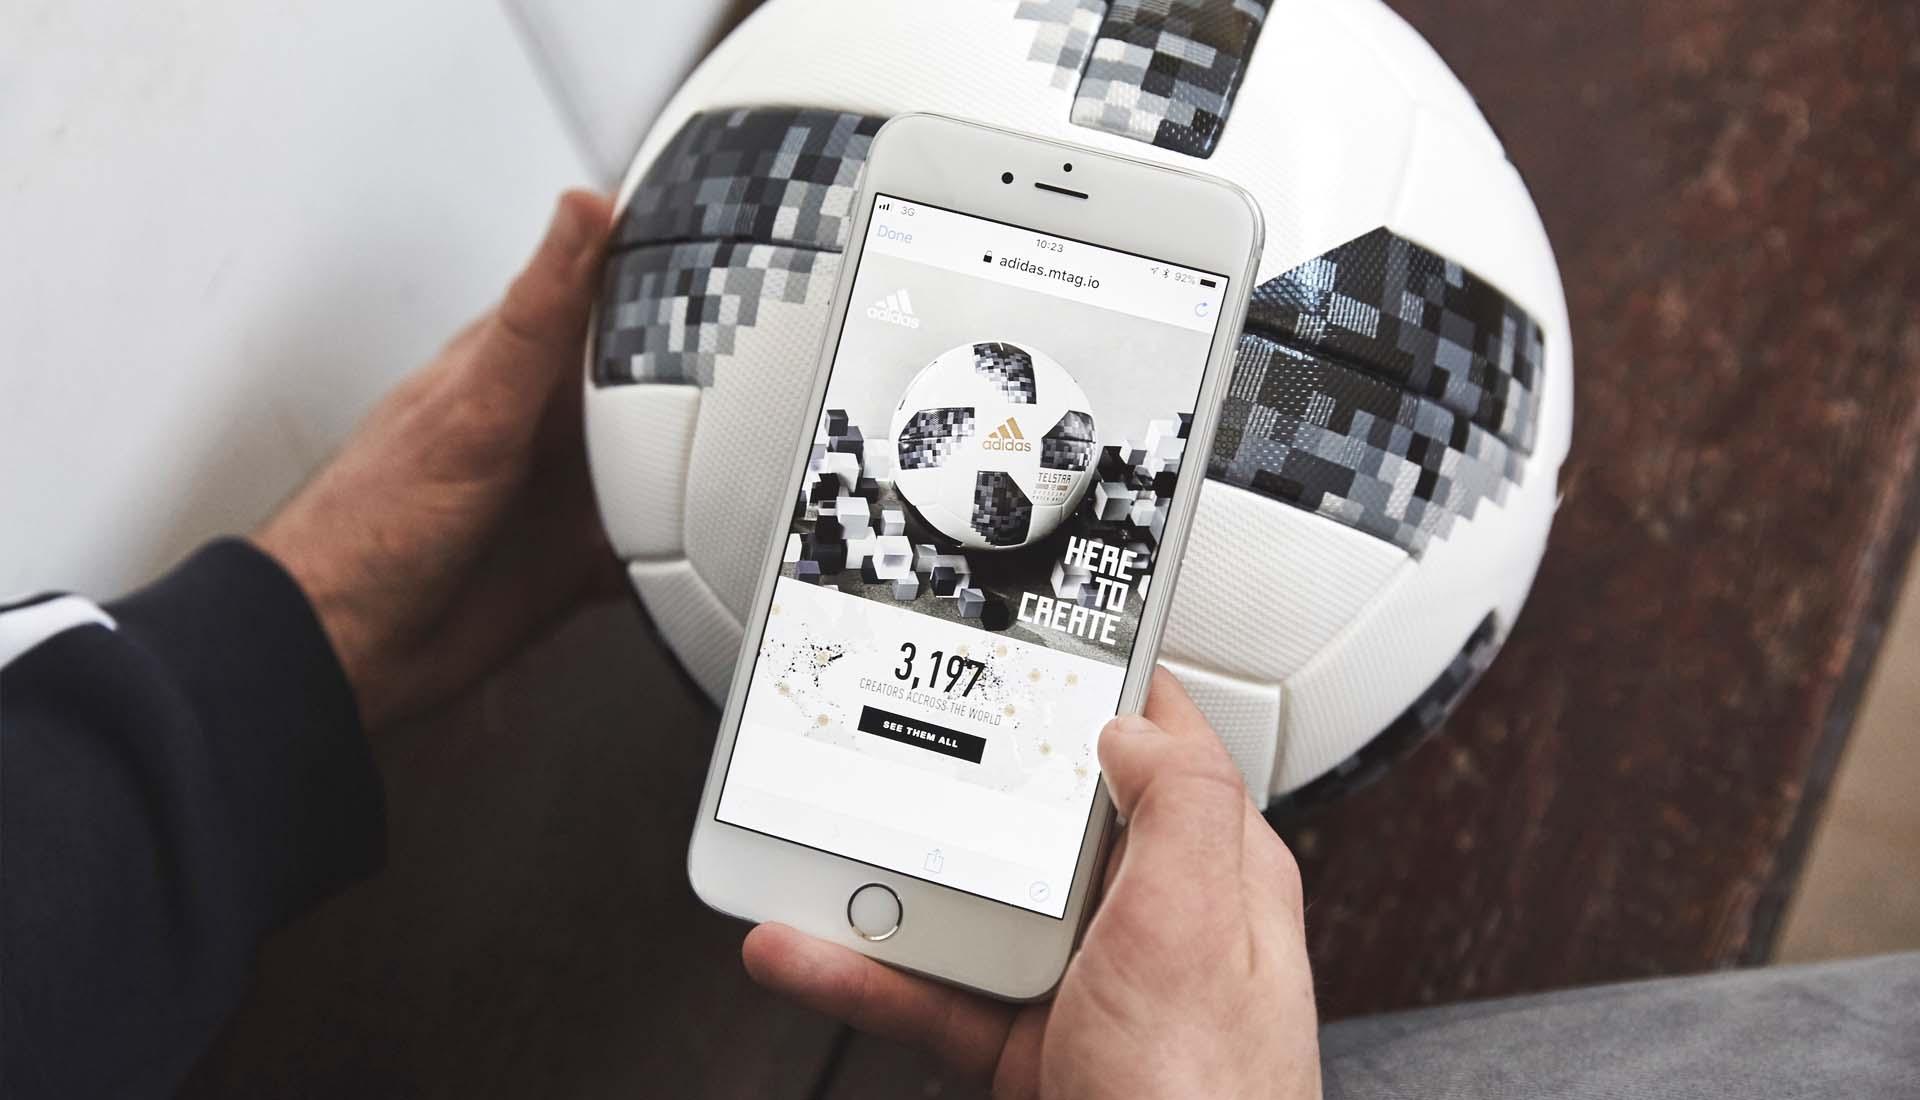 7cdb0b0f852c How Does The NFC Tech In The 2018 adidas Telstar Ball Work ...